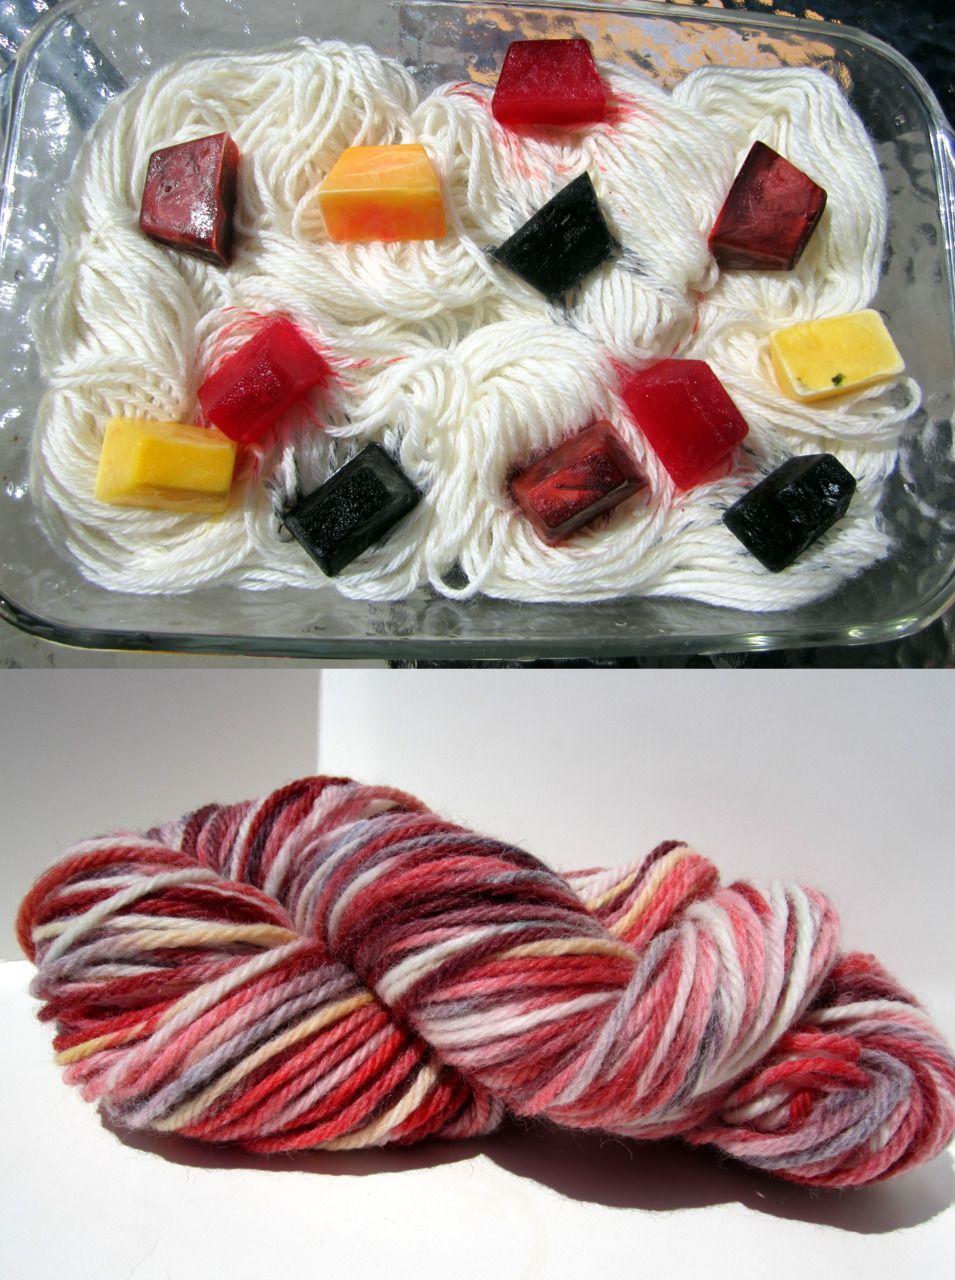 Dye yarn with frozen Kool Aid ice cubes. I've done it with kool aid but not frozen kool aid.